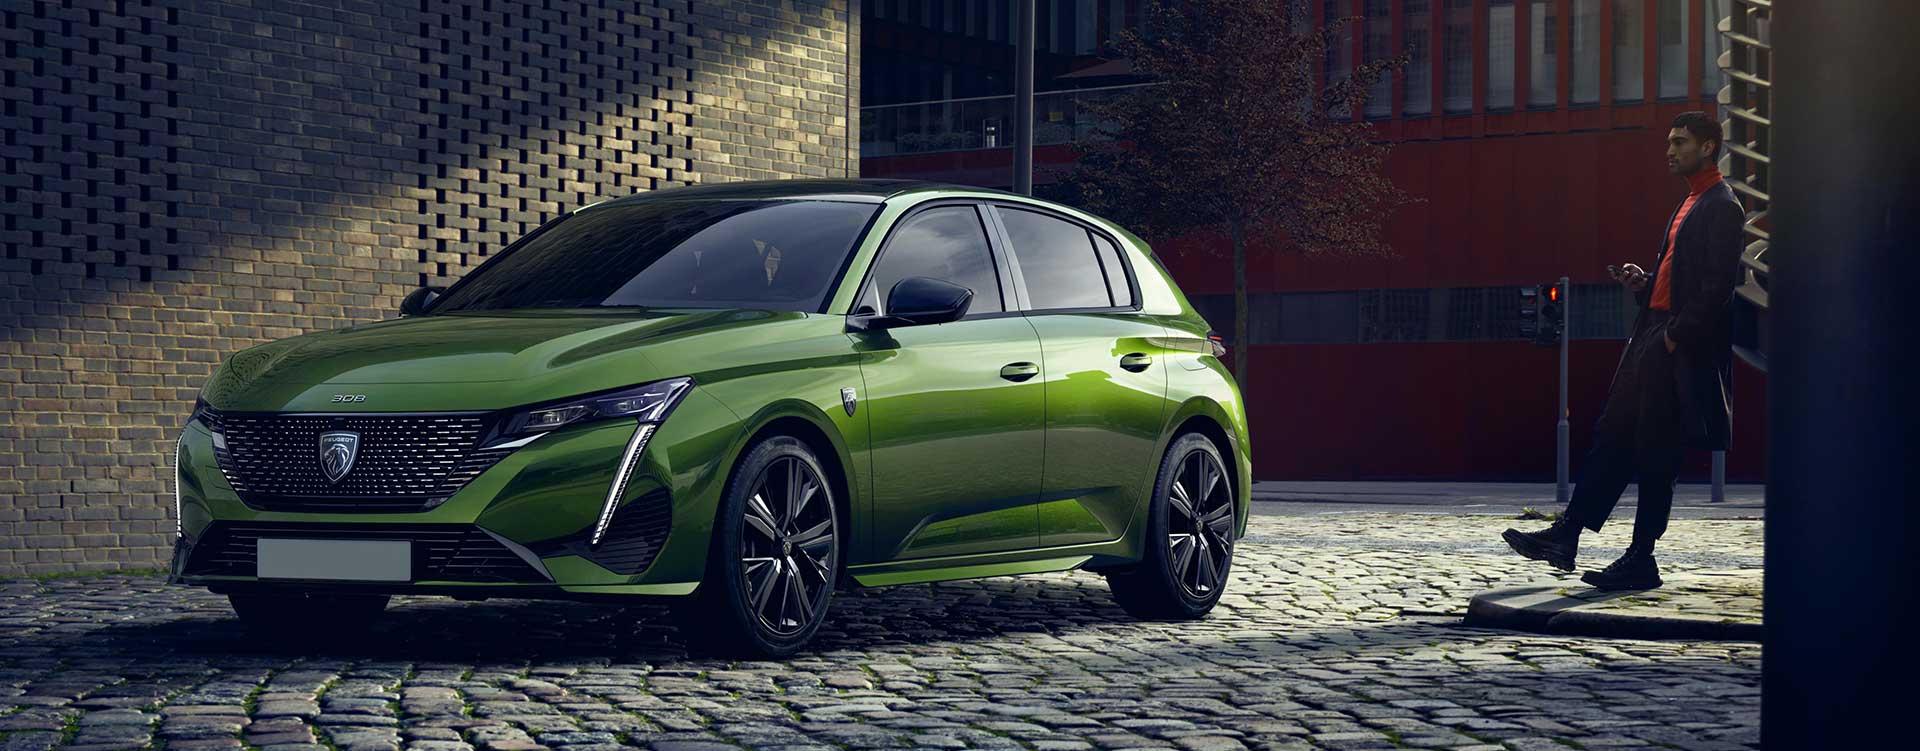 new-peugeot-308-hatchback-on-the-road